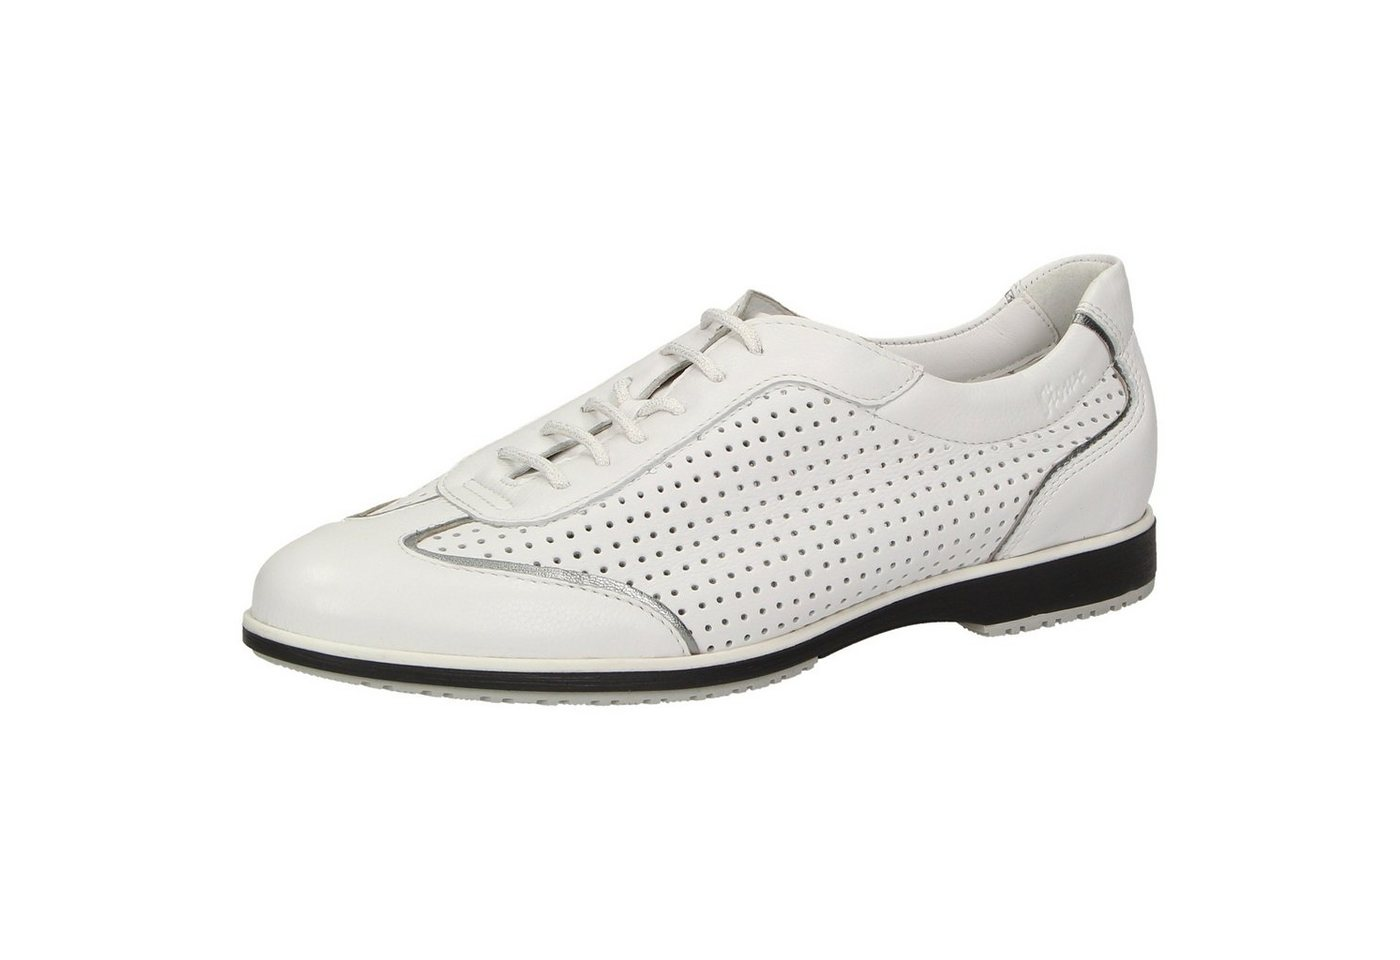 Damen SIOUX Dareila Sneaker weiß | 04054765414707